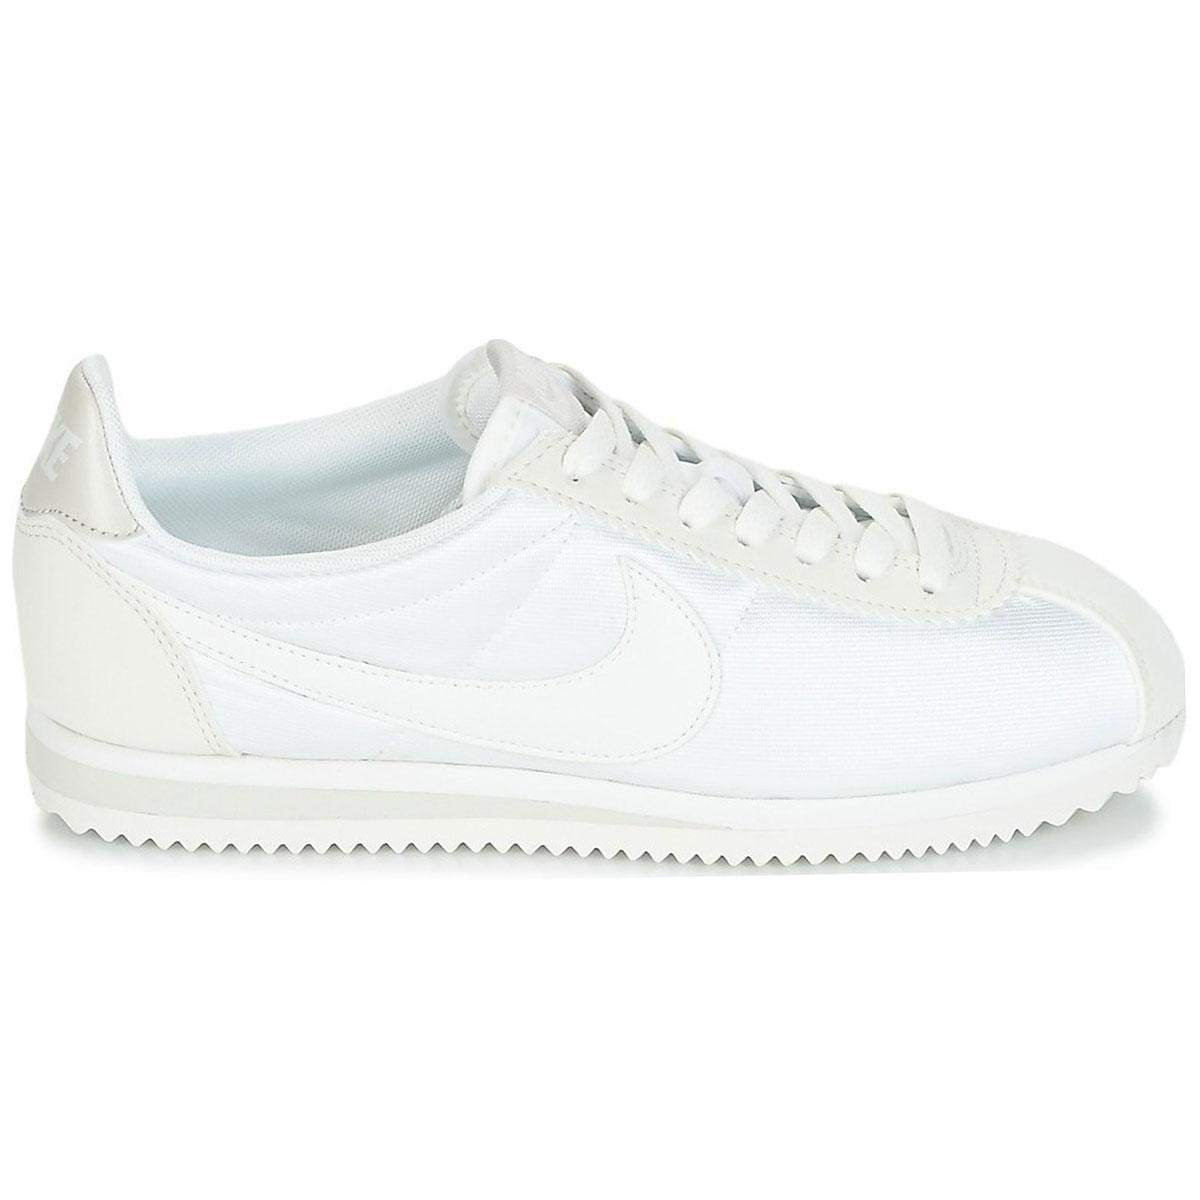 Nike WMNS Classic Cortez Nylon Damen Sneaker weiß beige 749864 103